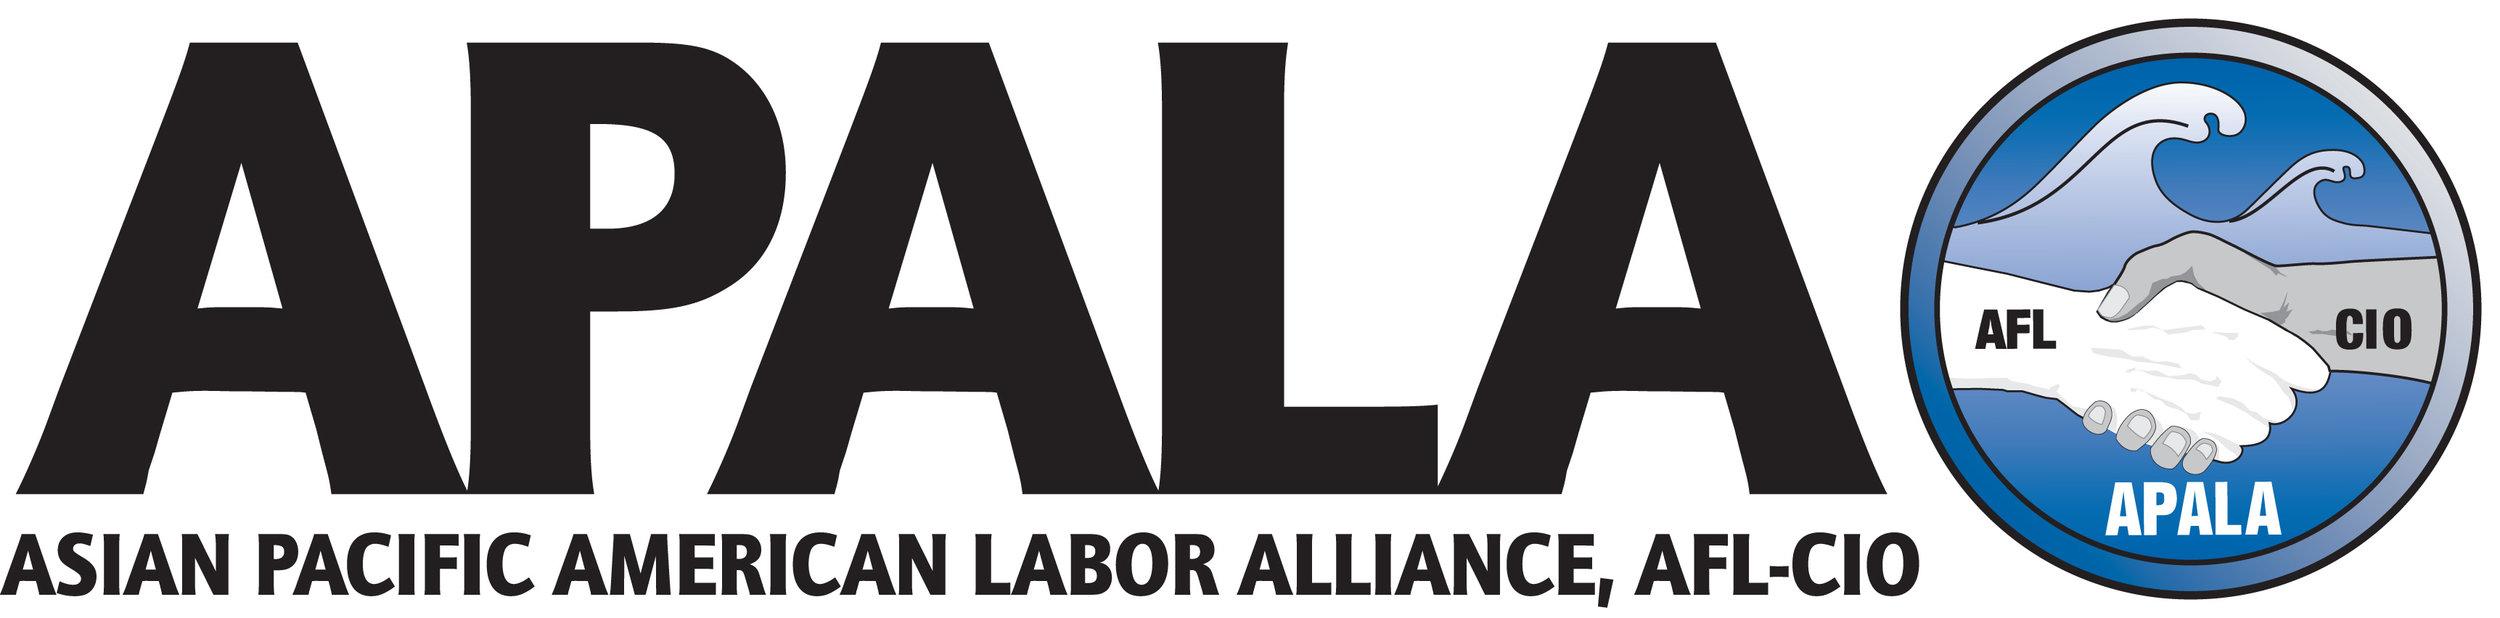 APALA-logoype-mark.jpg